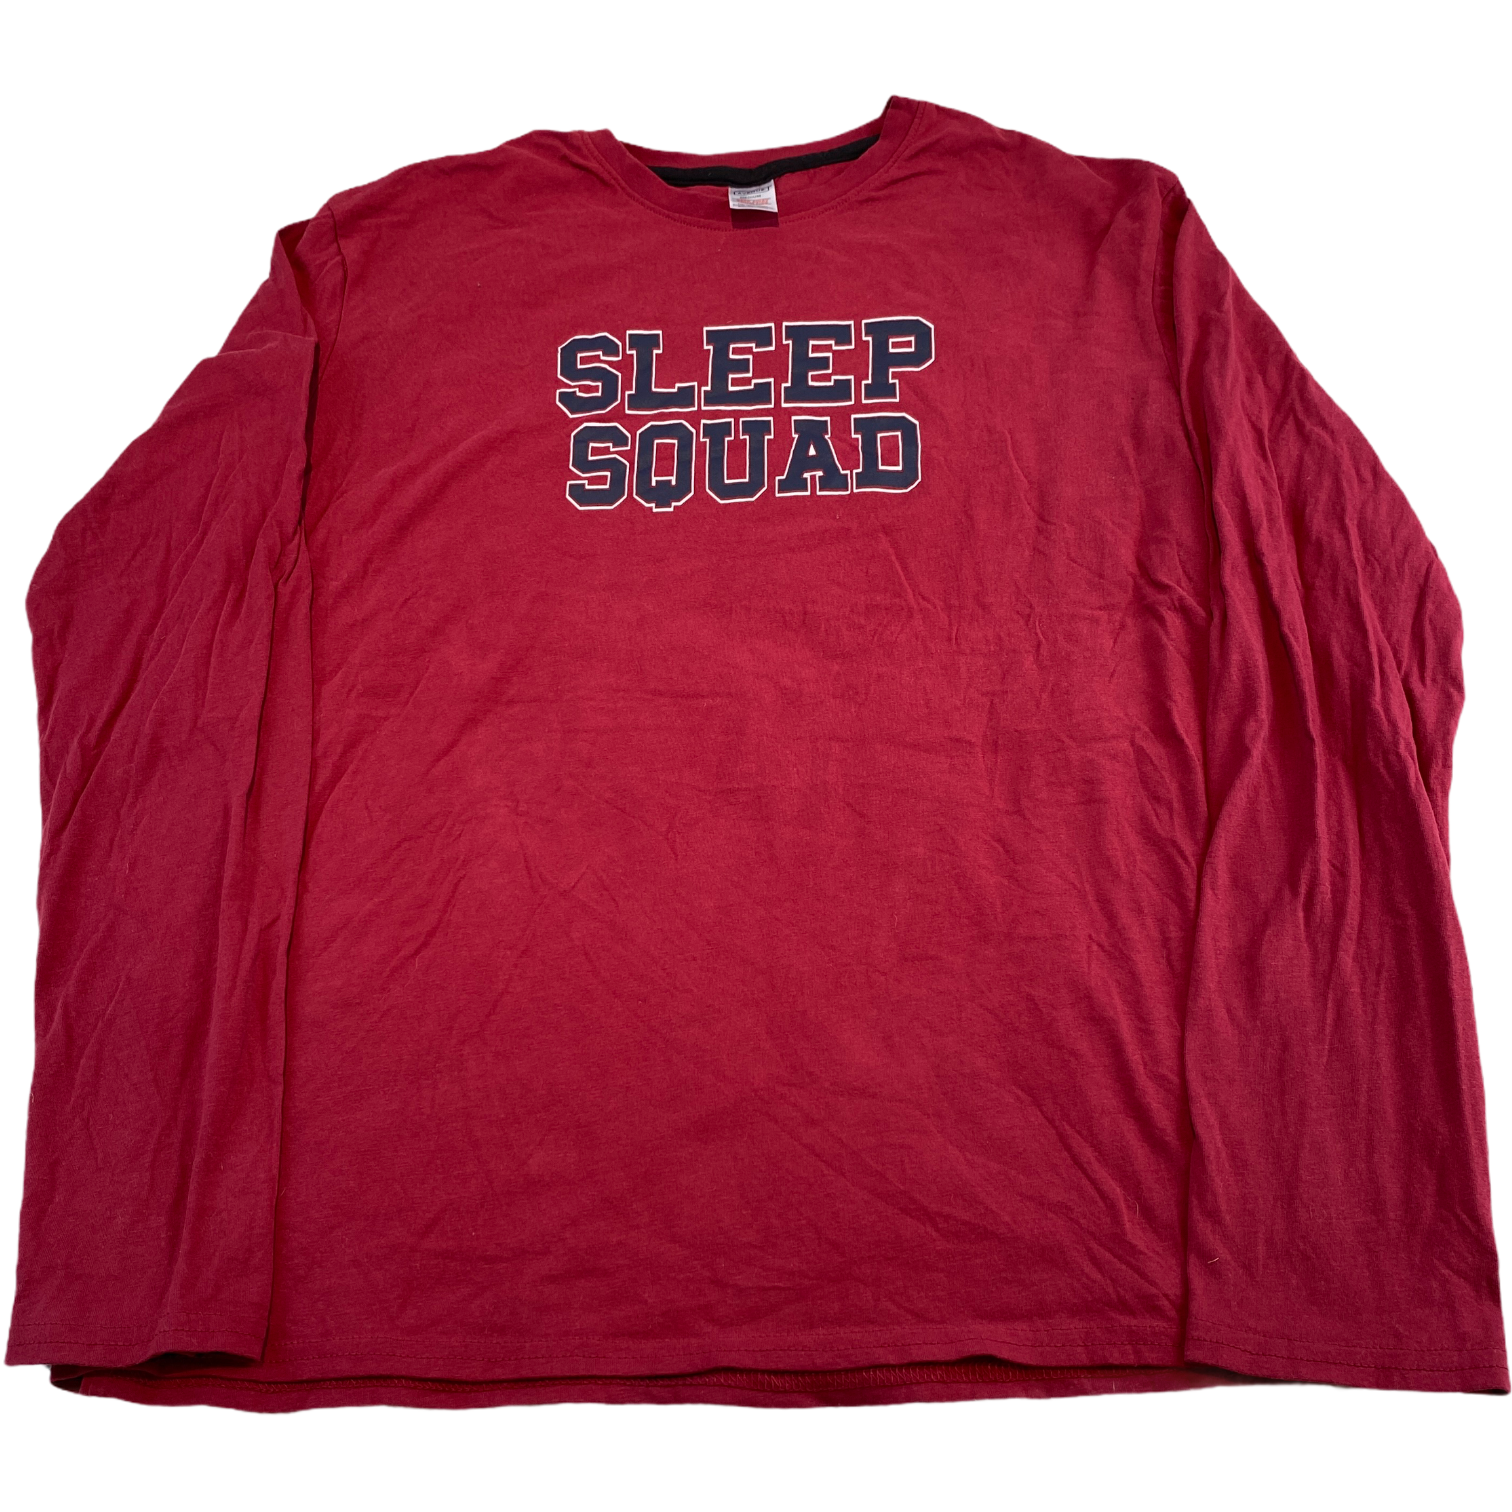 AVENUE Mens Sweatshirt Medium Red Sleep Squad Graphic Pullover